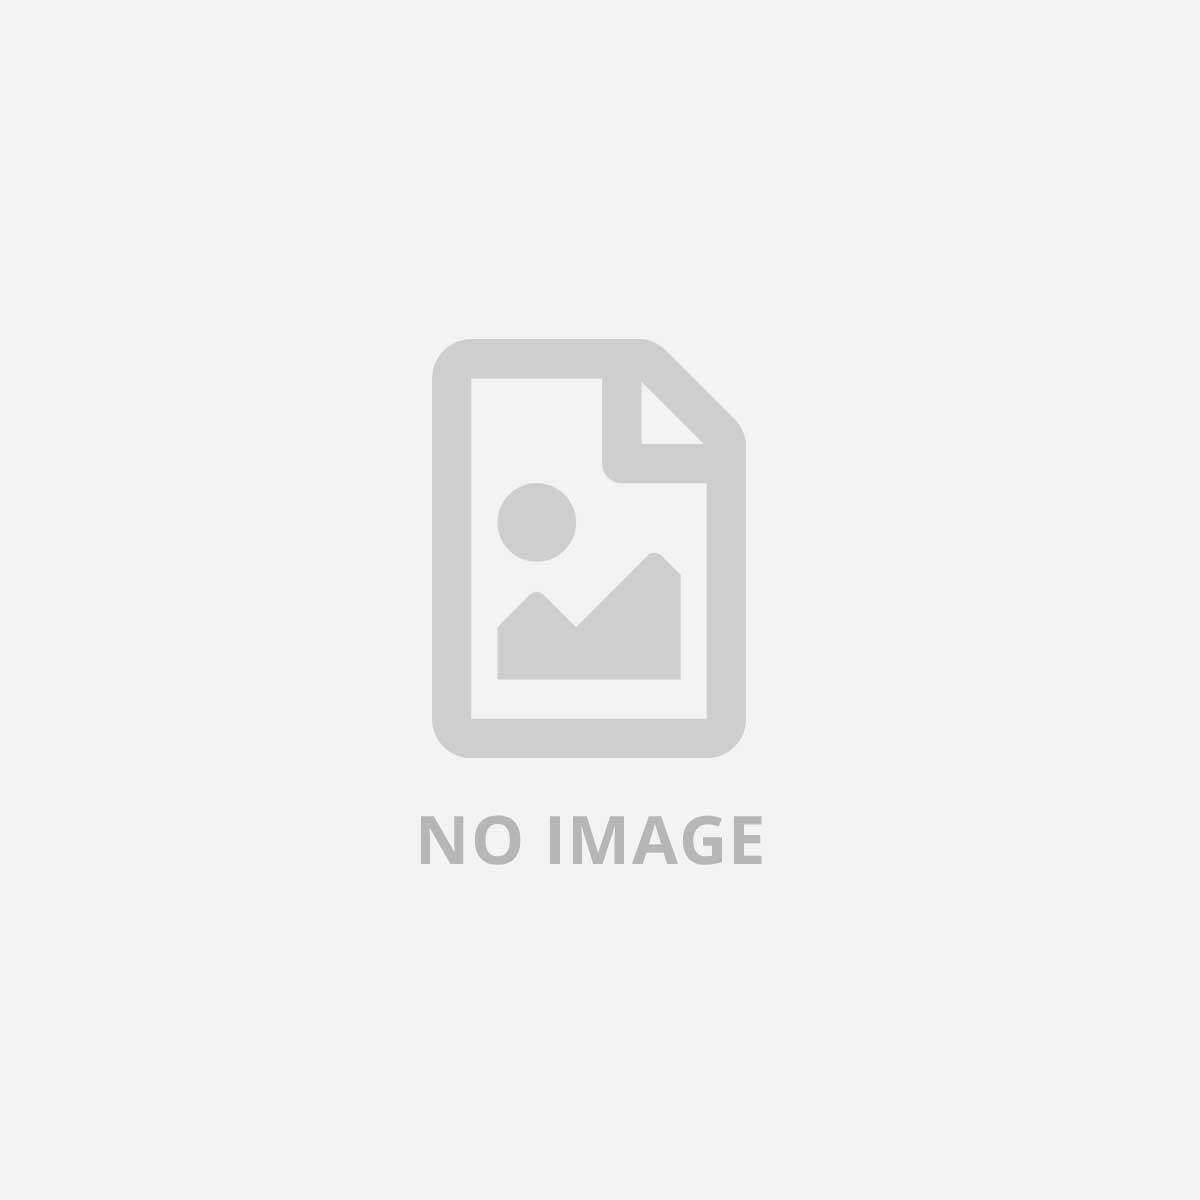 ALCATEL 1V 5 5 4G METALLIC BLUE